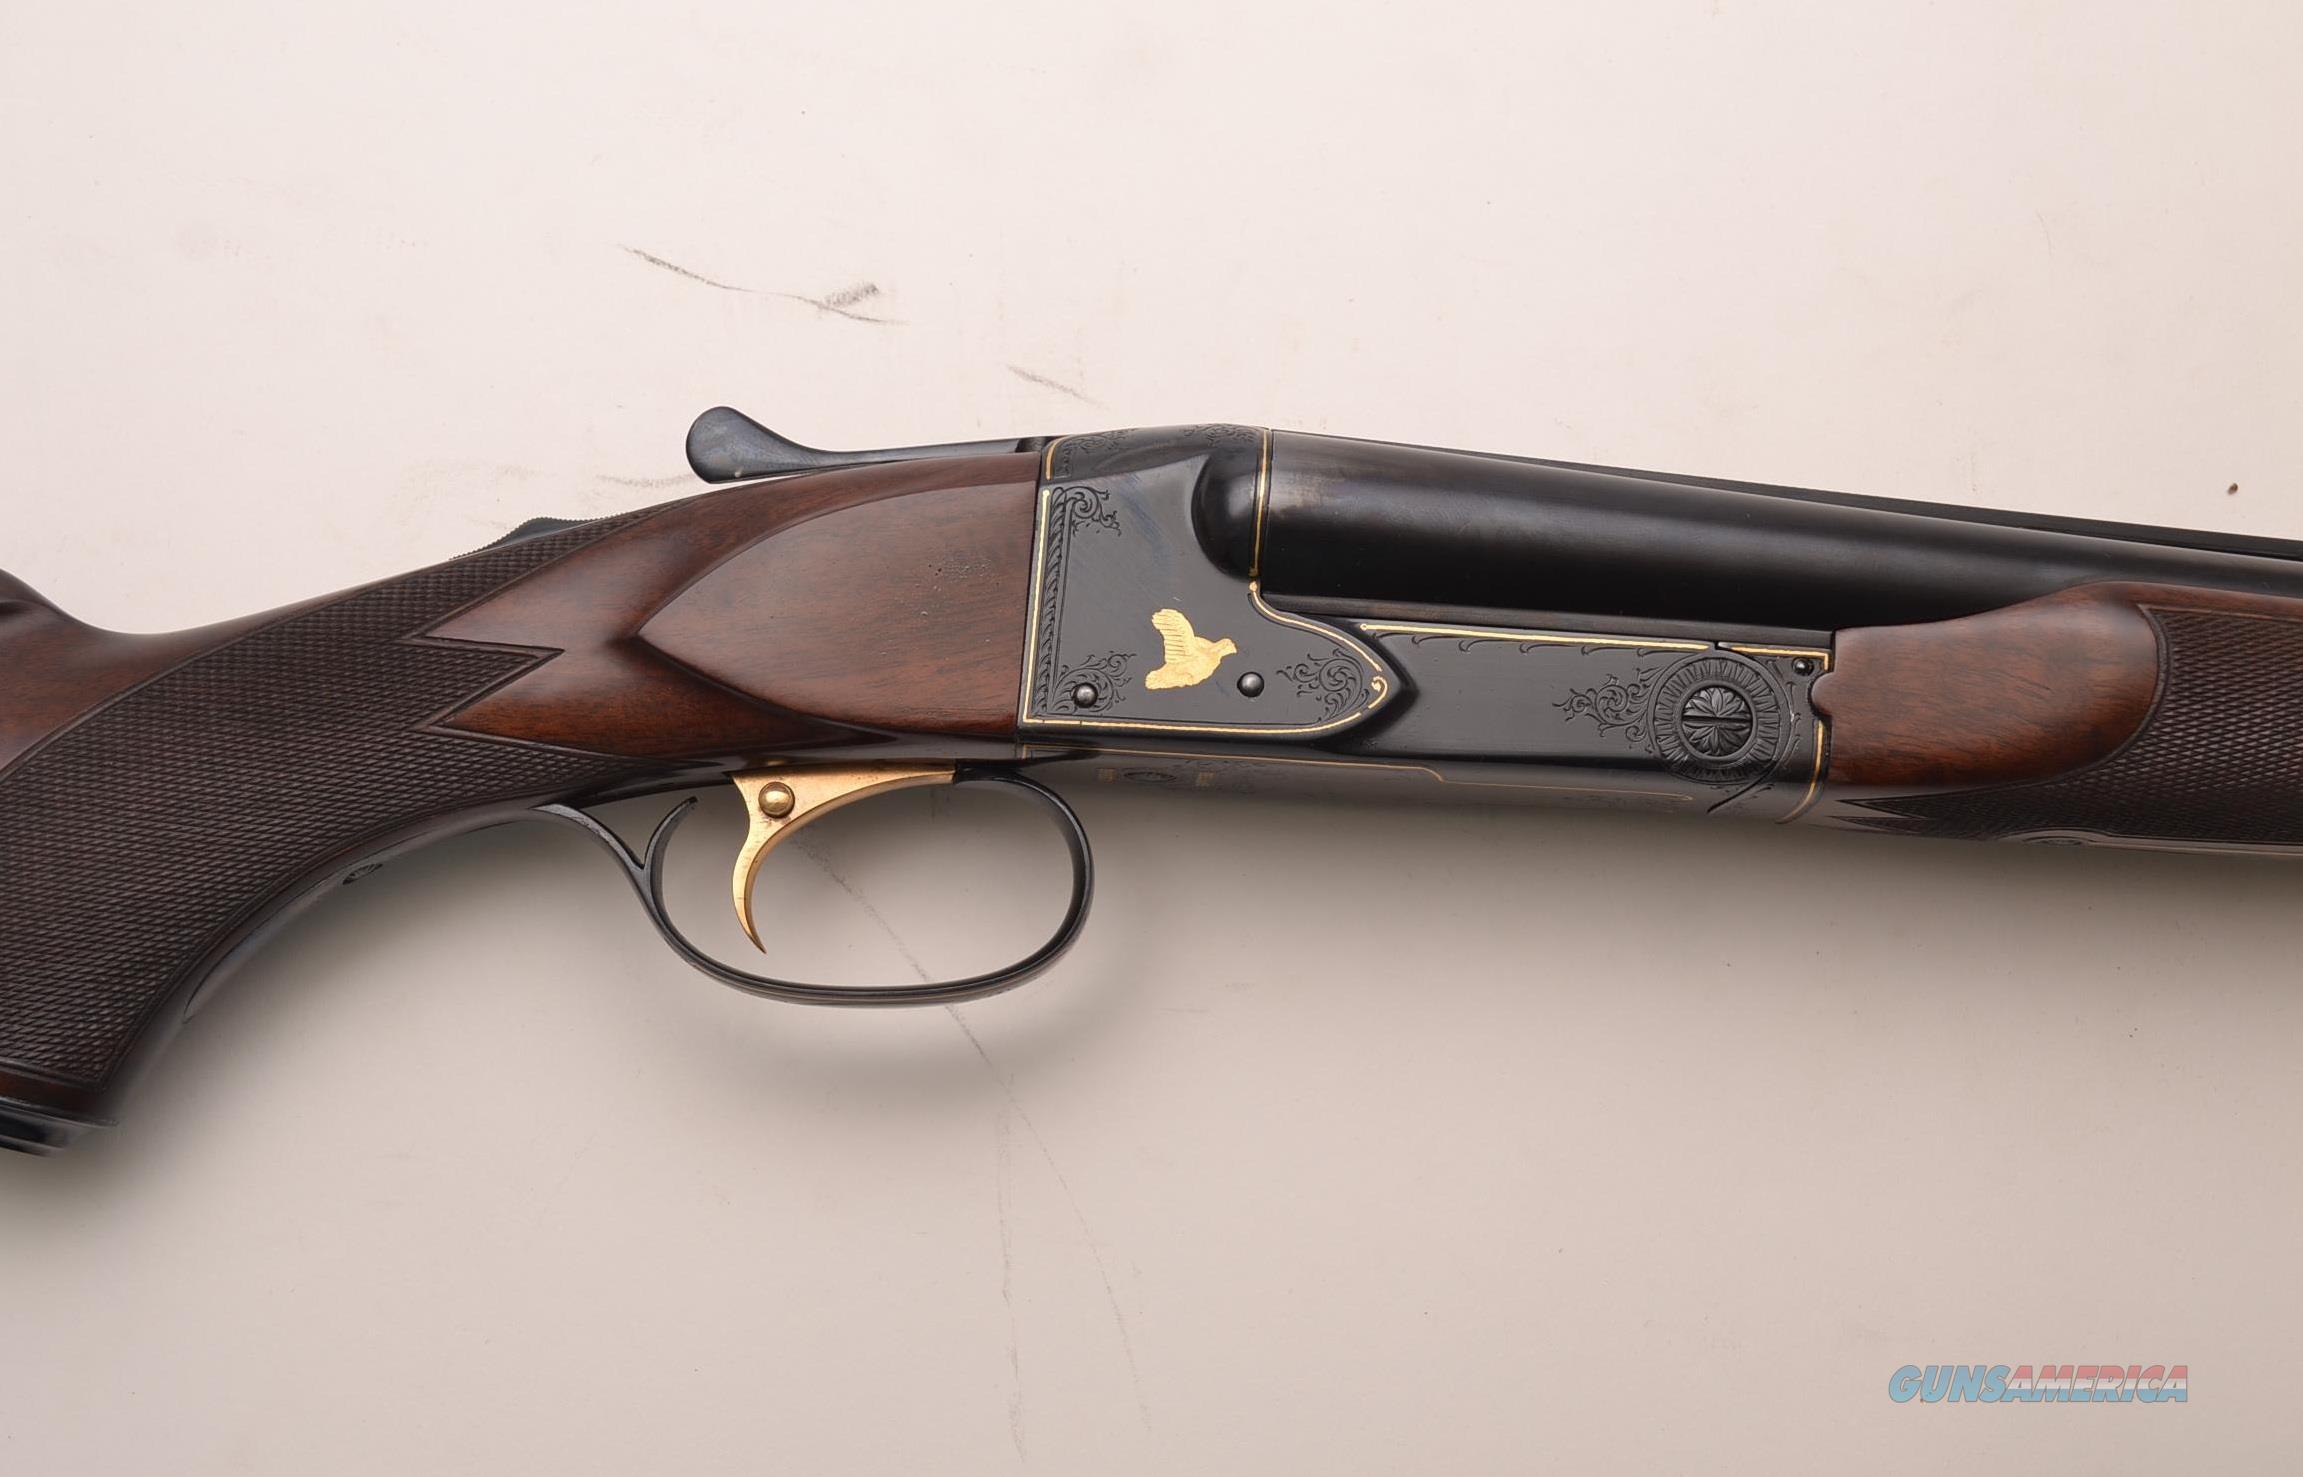 Winchester Model 21, Deluxe Skeet, 20ga.  Guns > Shotguns > Winchester Shotguns - Modern > SxS